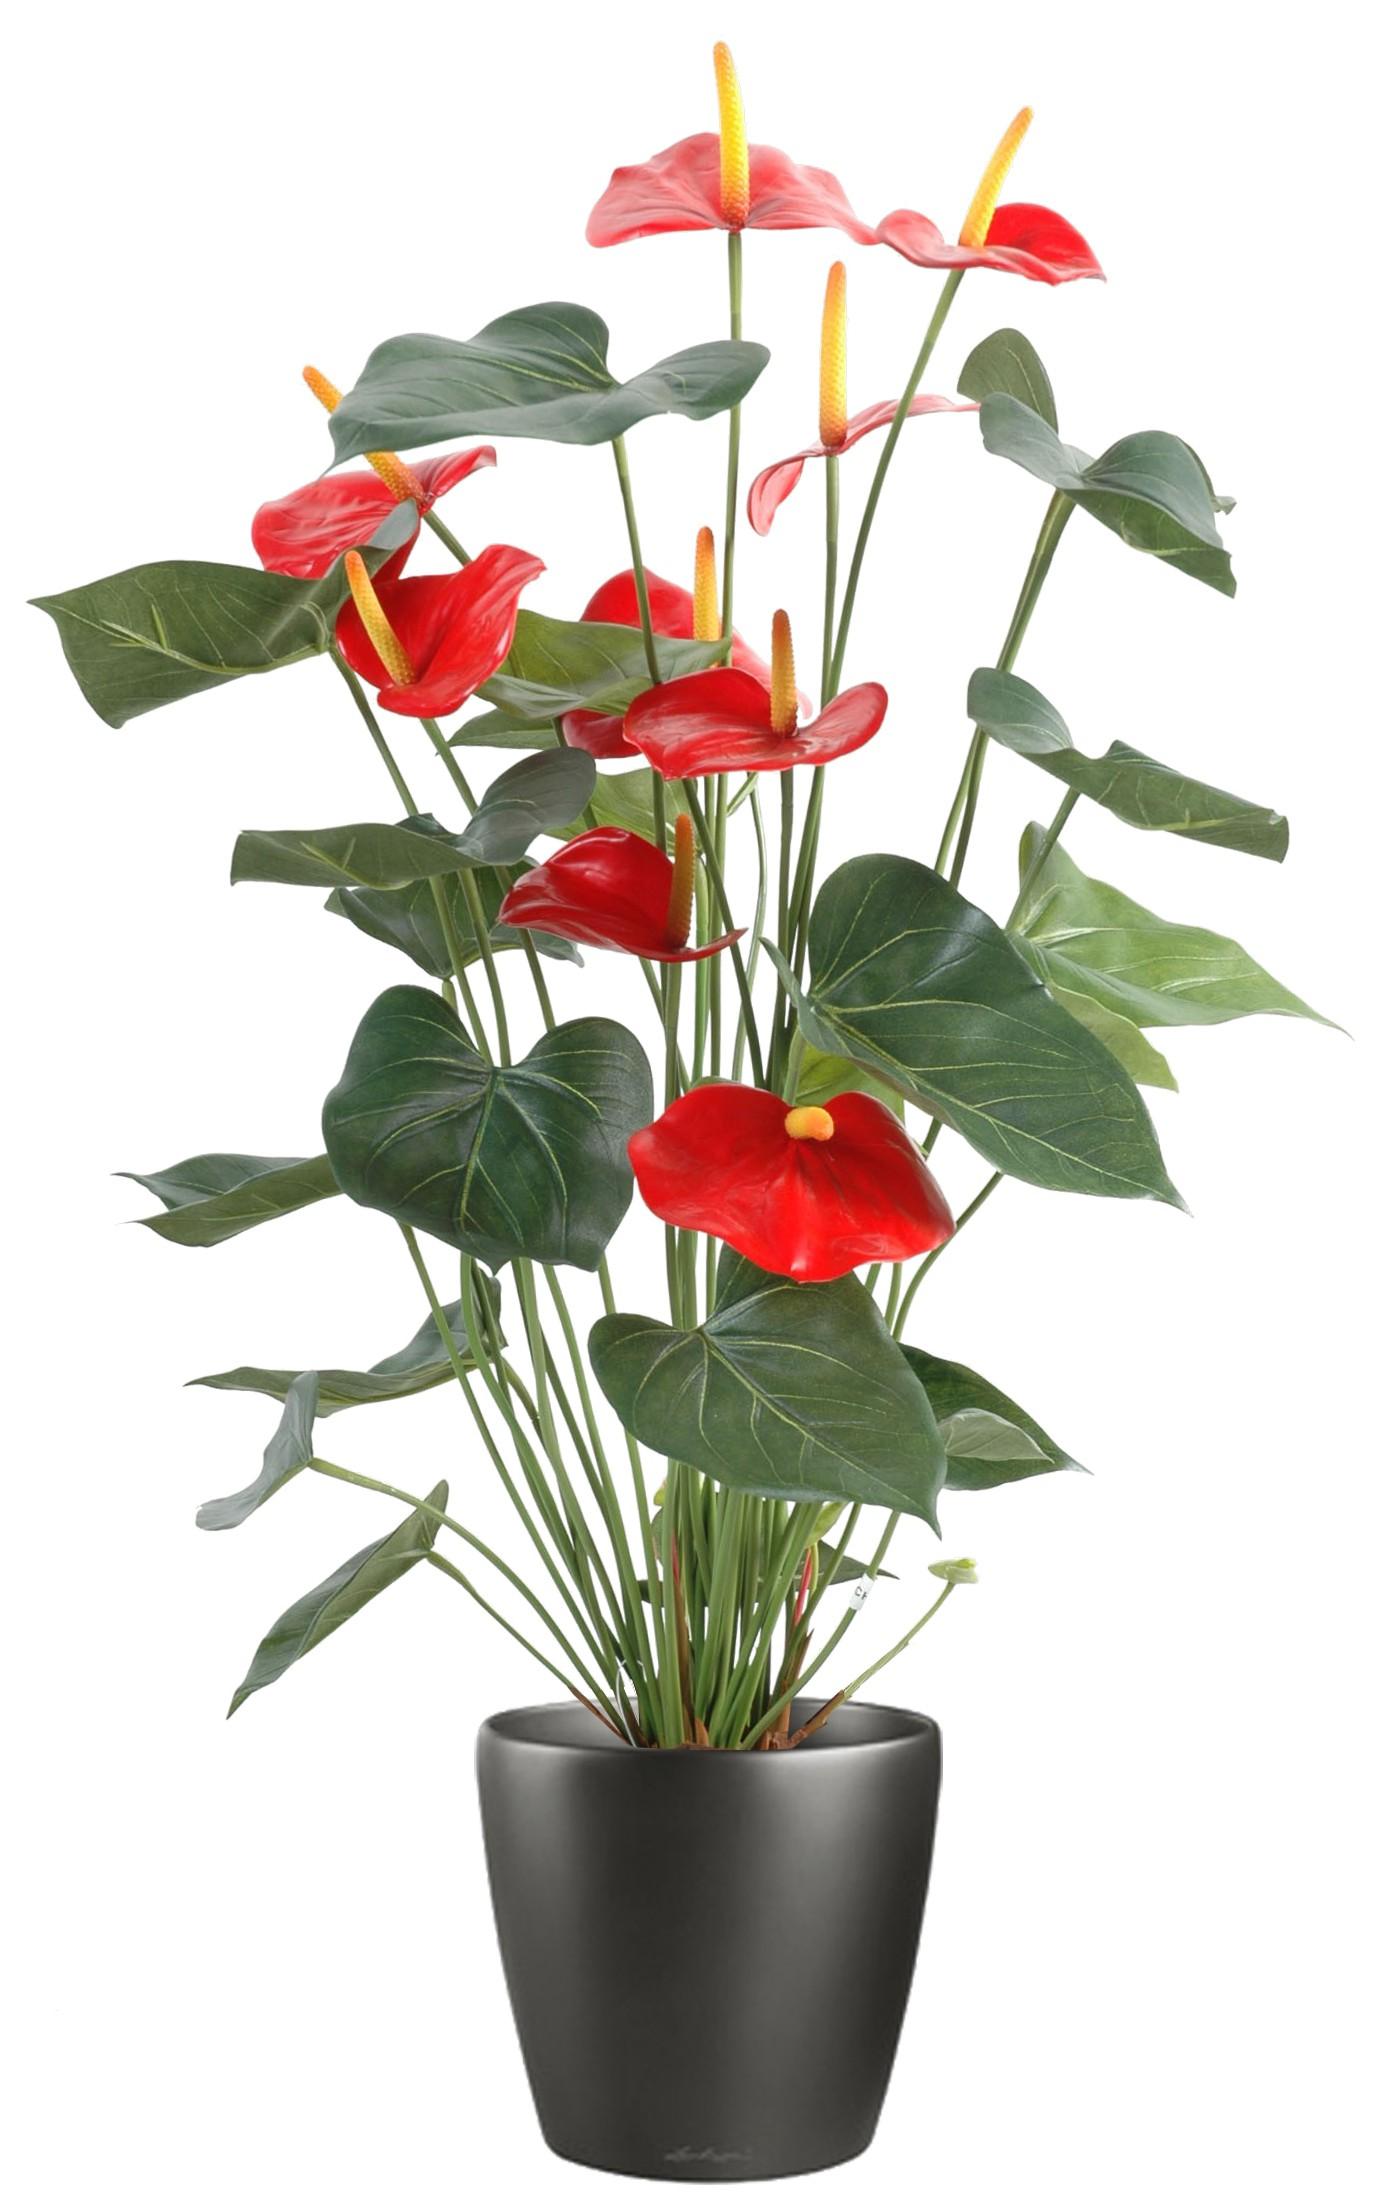 Fleurs Exotiques Artificielles Fleurs Artificielles Reflets